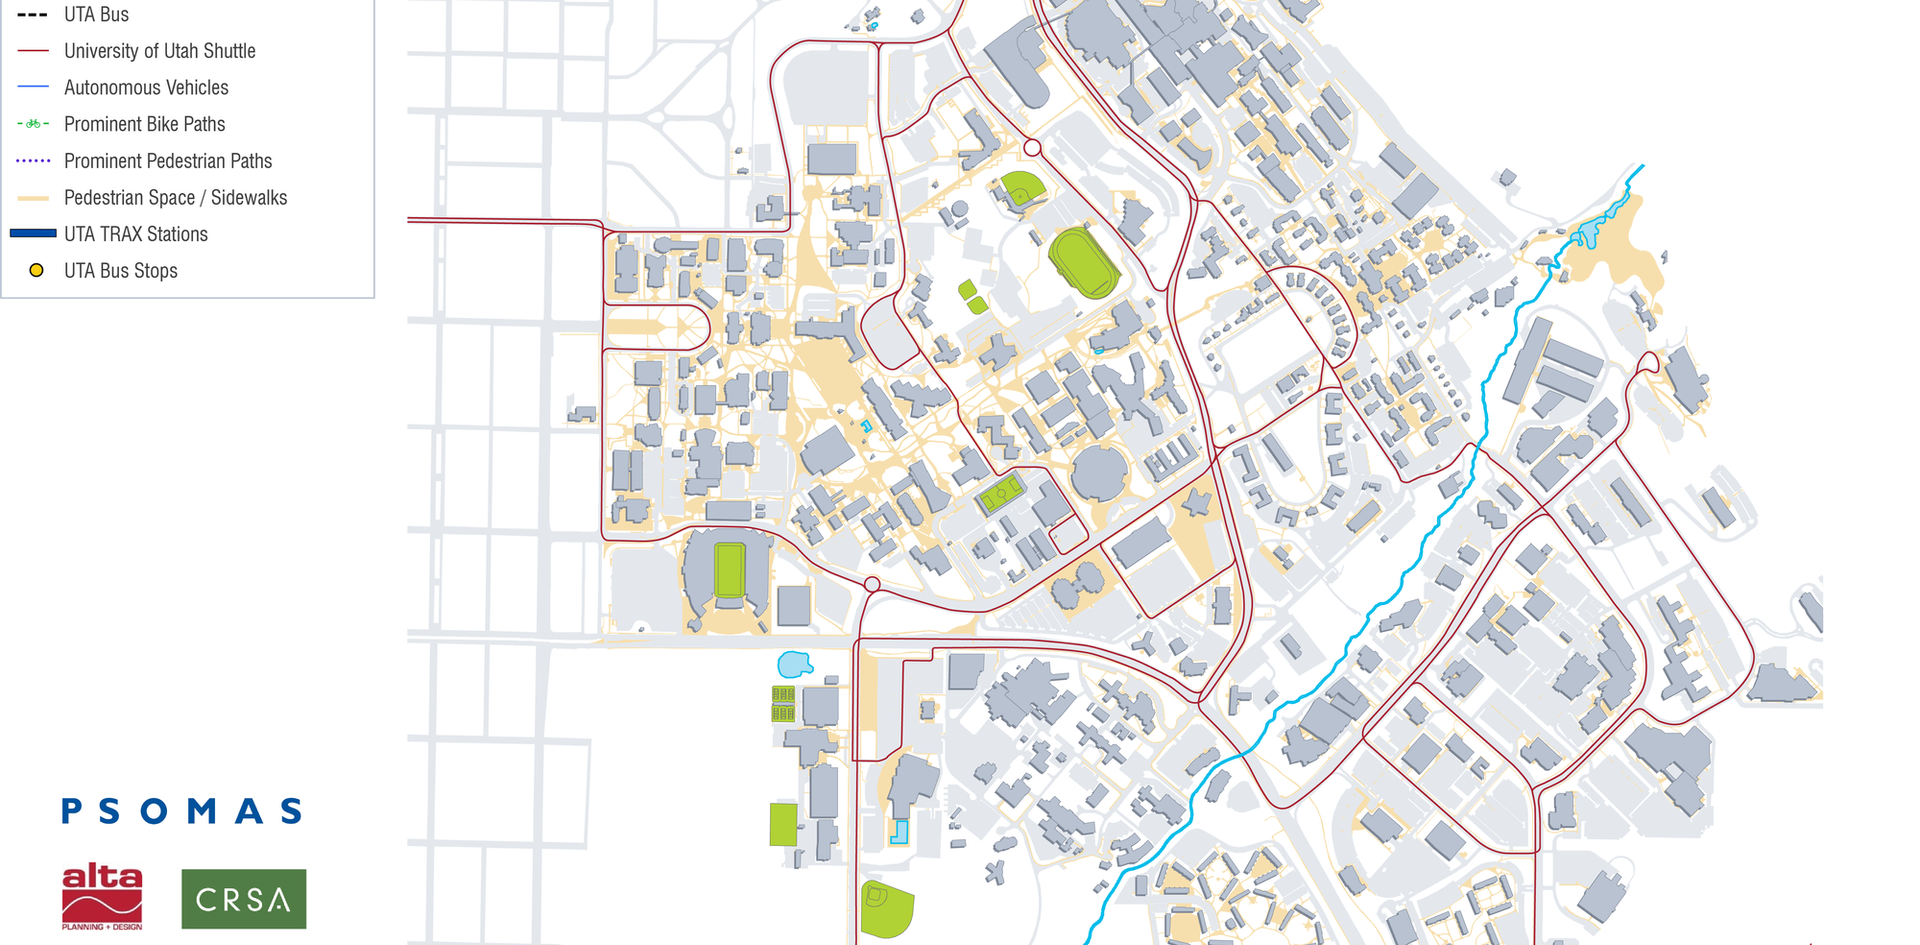 U of U Campus Shuttle Routes